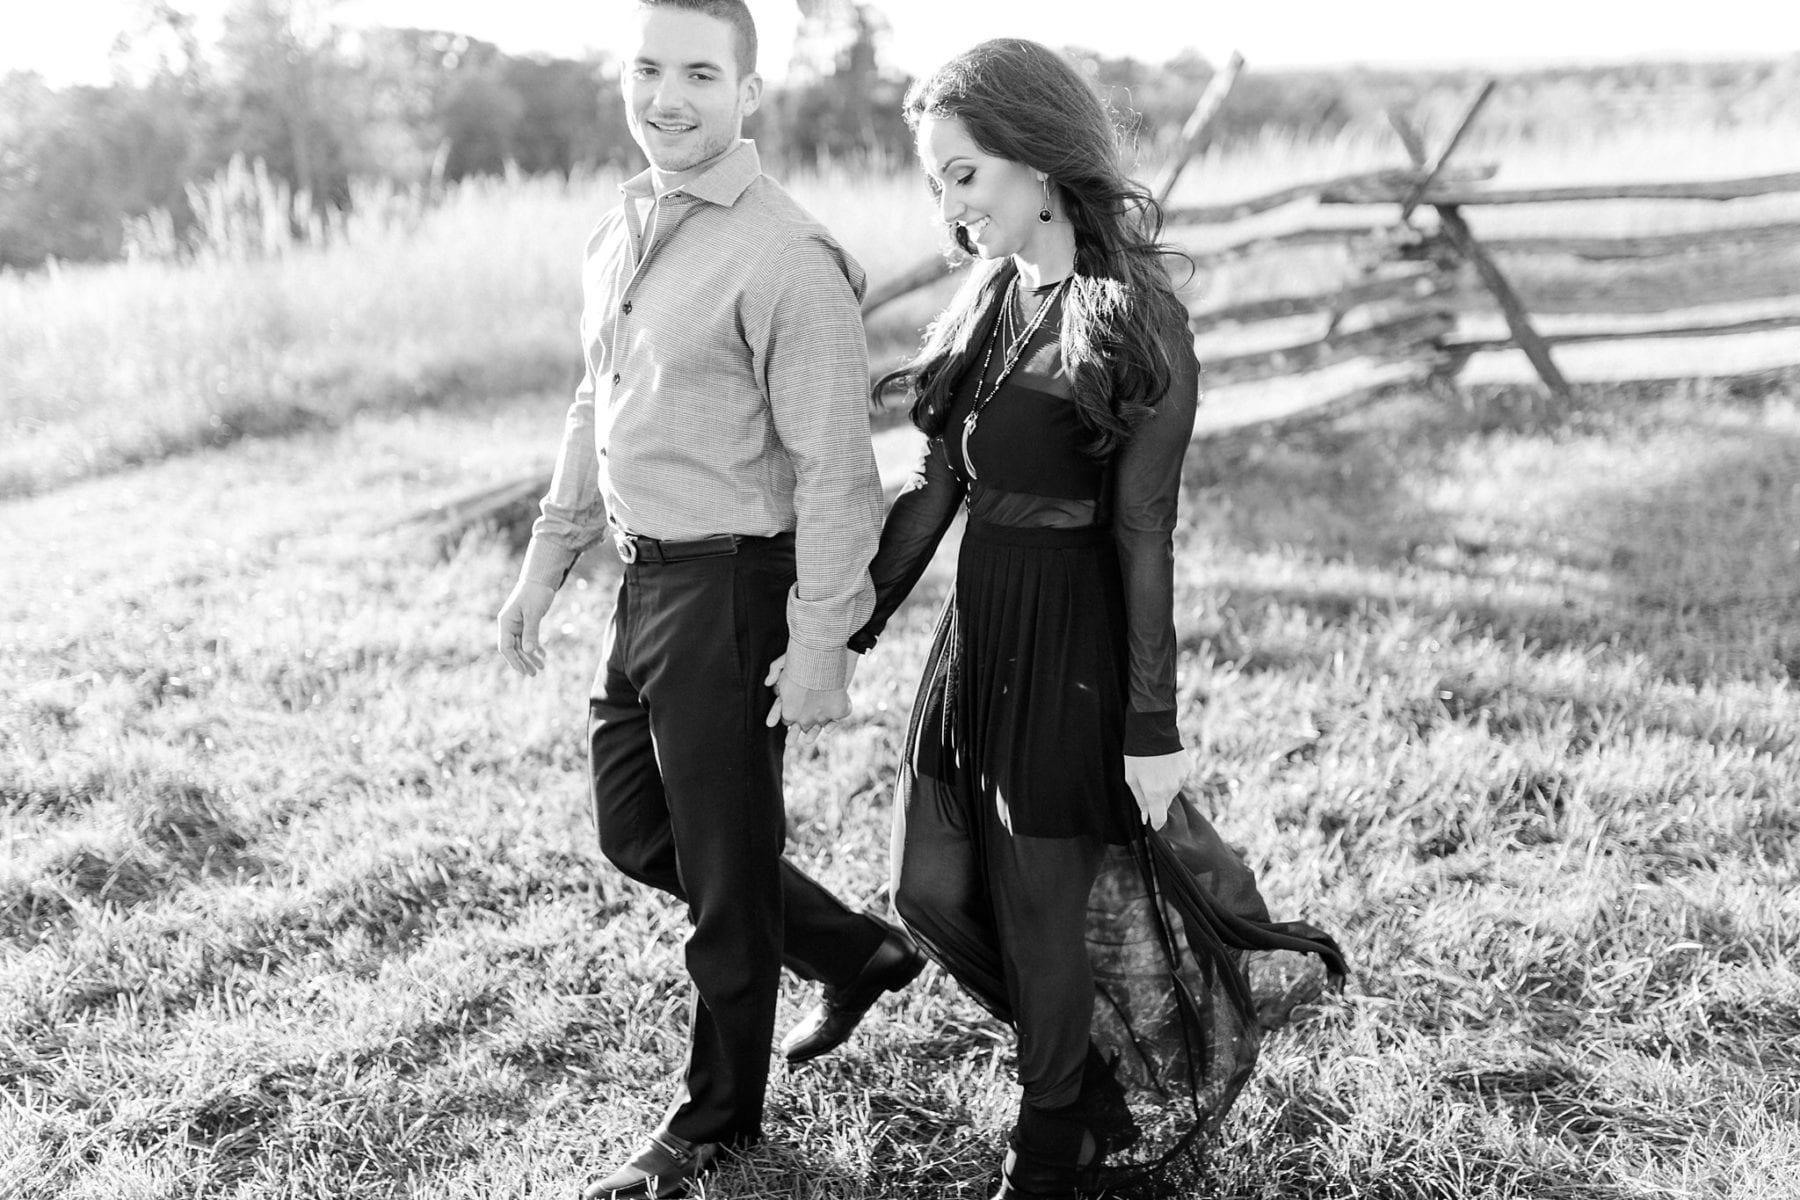 Manassas Battlefield Portraits Virginia Wedding Photographer Megan Kelsey Photography Lianne & Chris-144.jpg